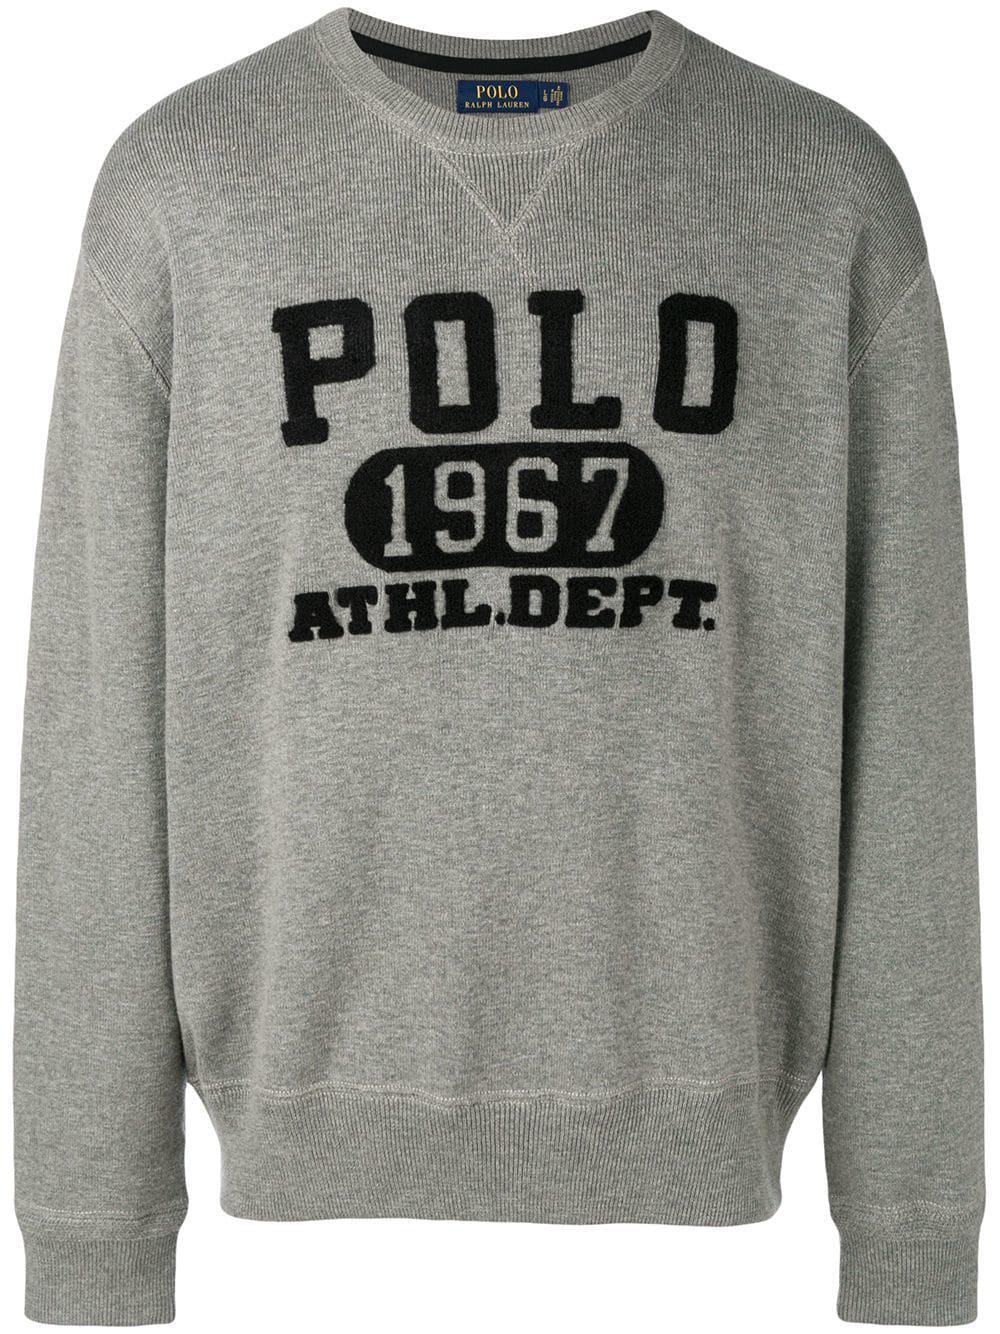 b138ec926d2b Lyst - Polo Ralph Lauren Polo 1967 Print Sweatshirt in Gray for Men